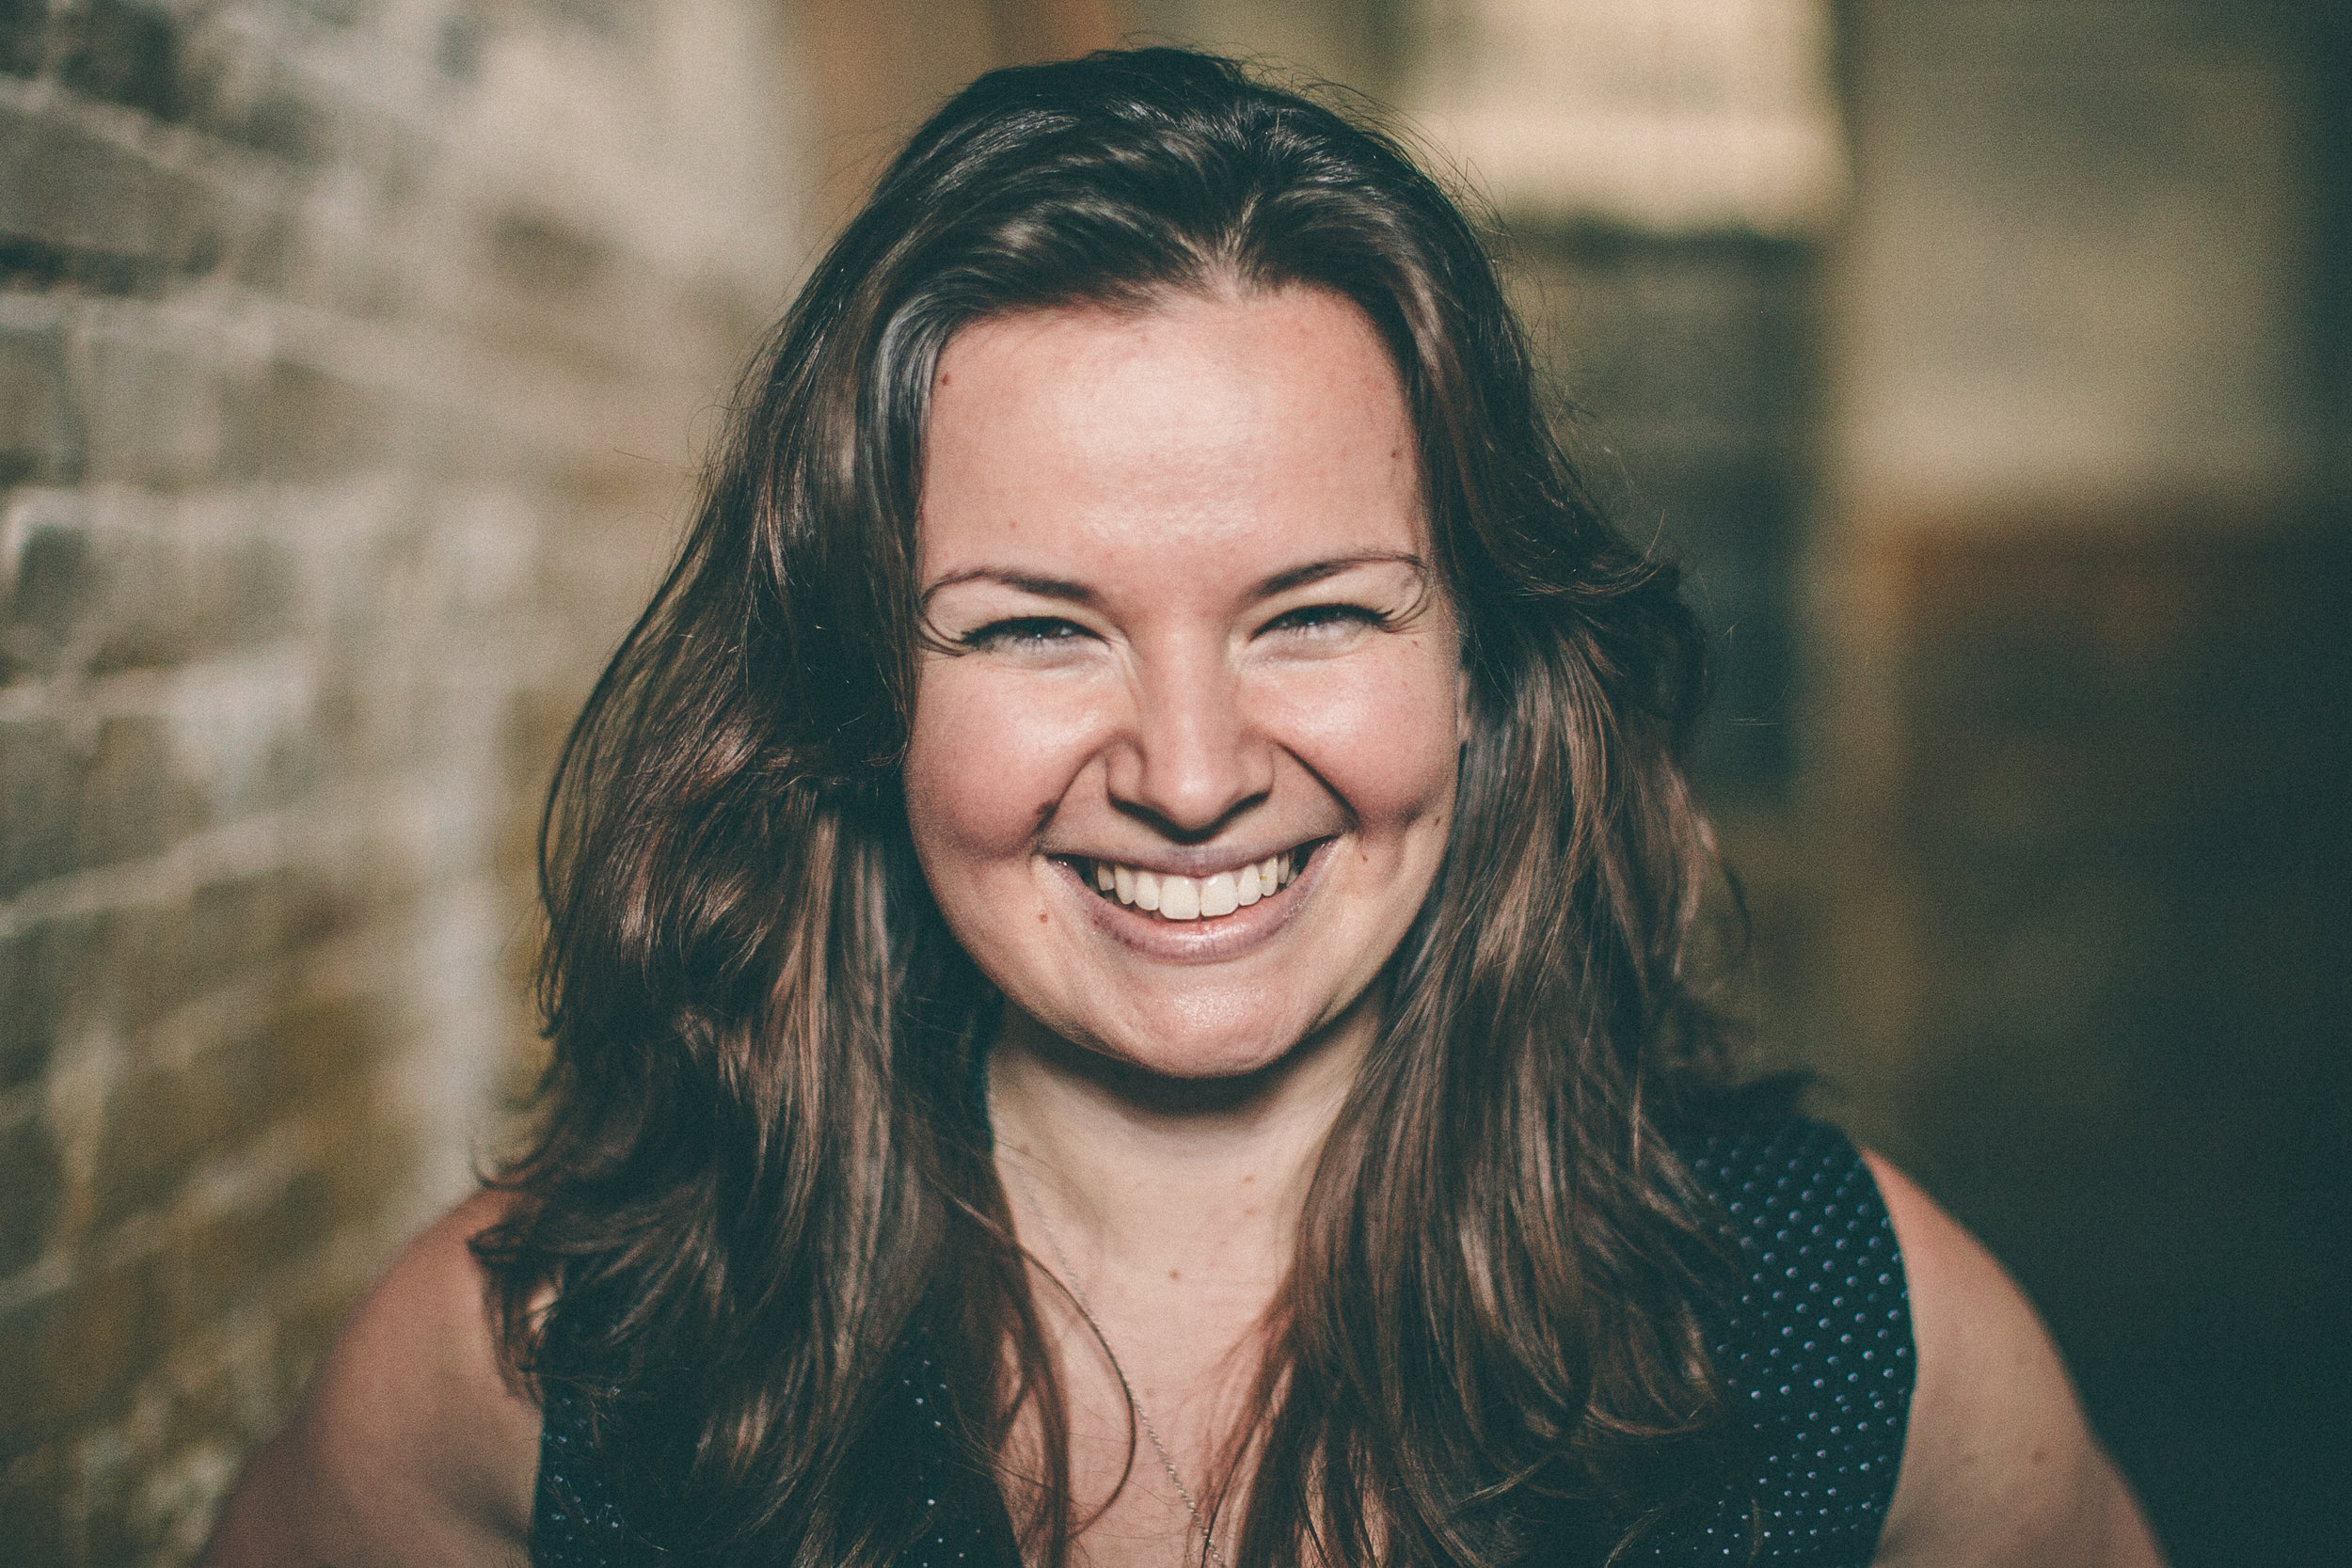 Book author Adina Grigore. #glowing